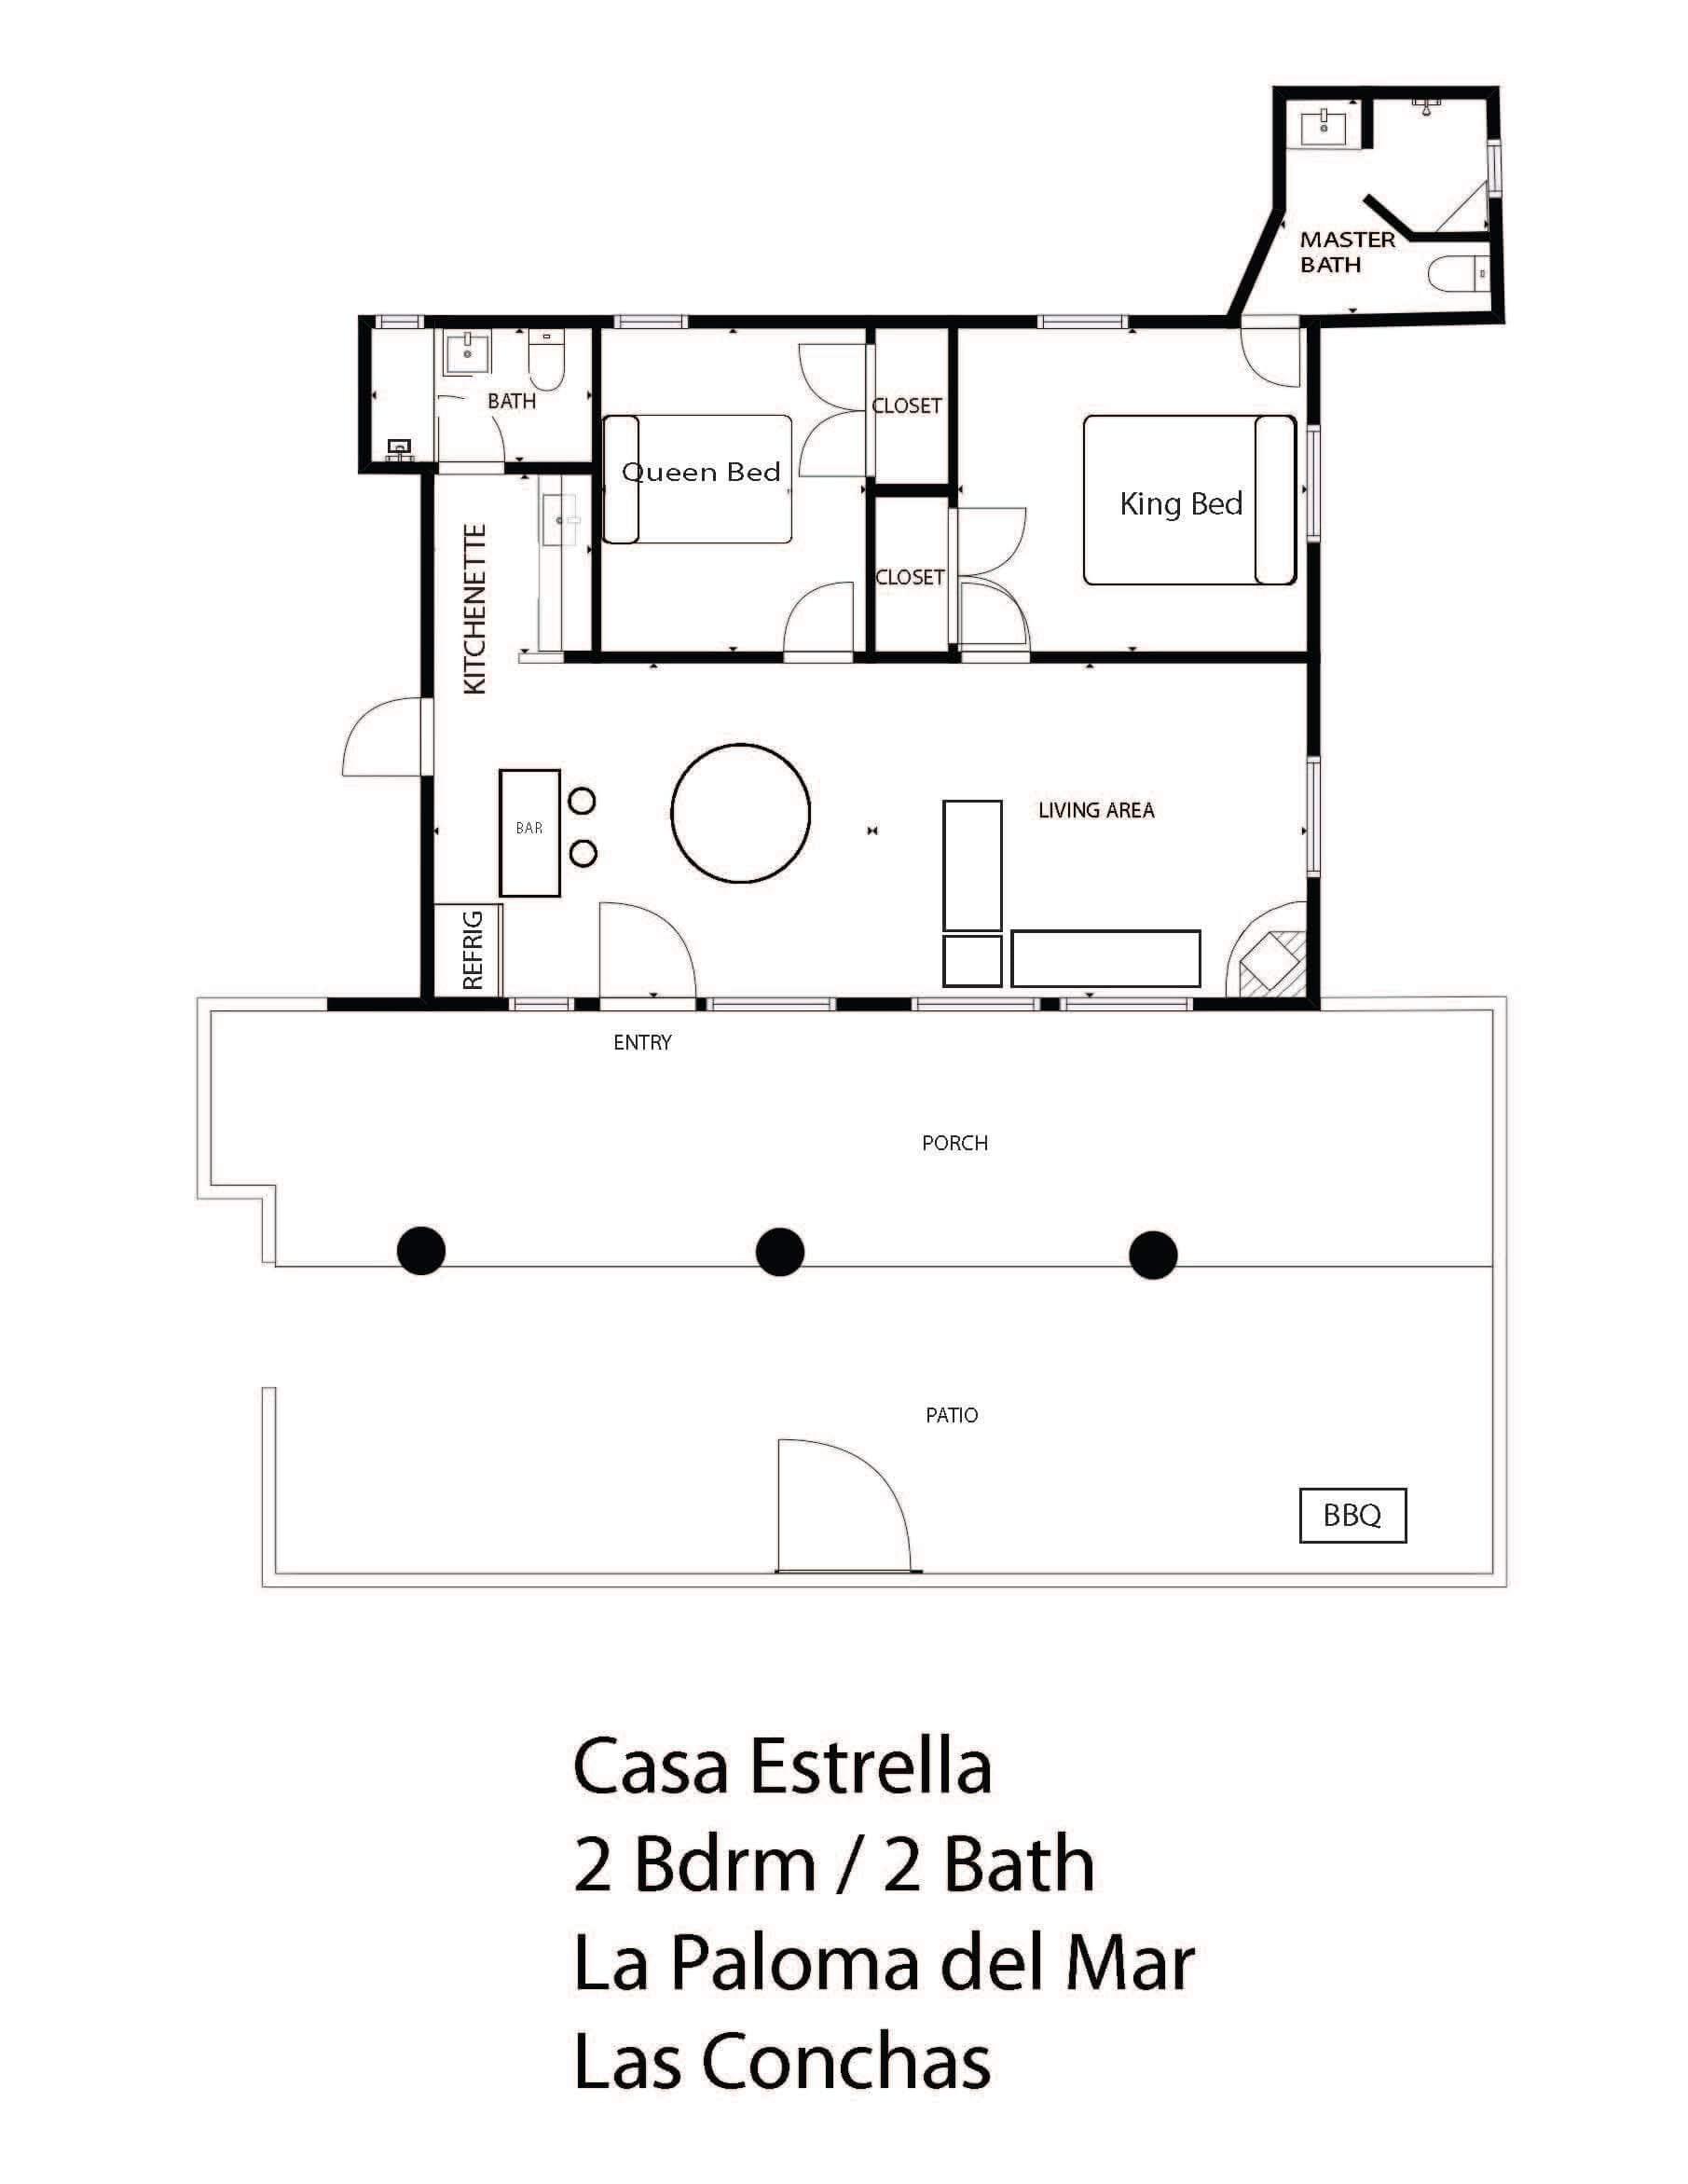 casa estrella floorplan